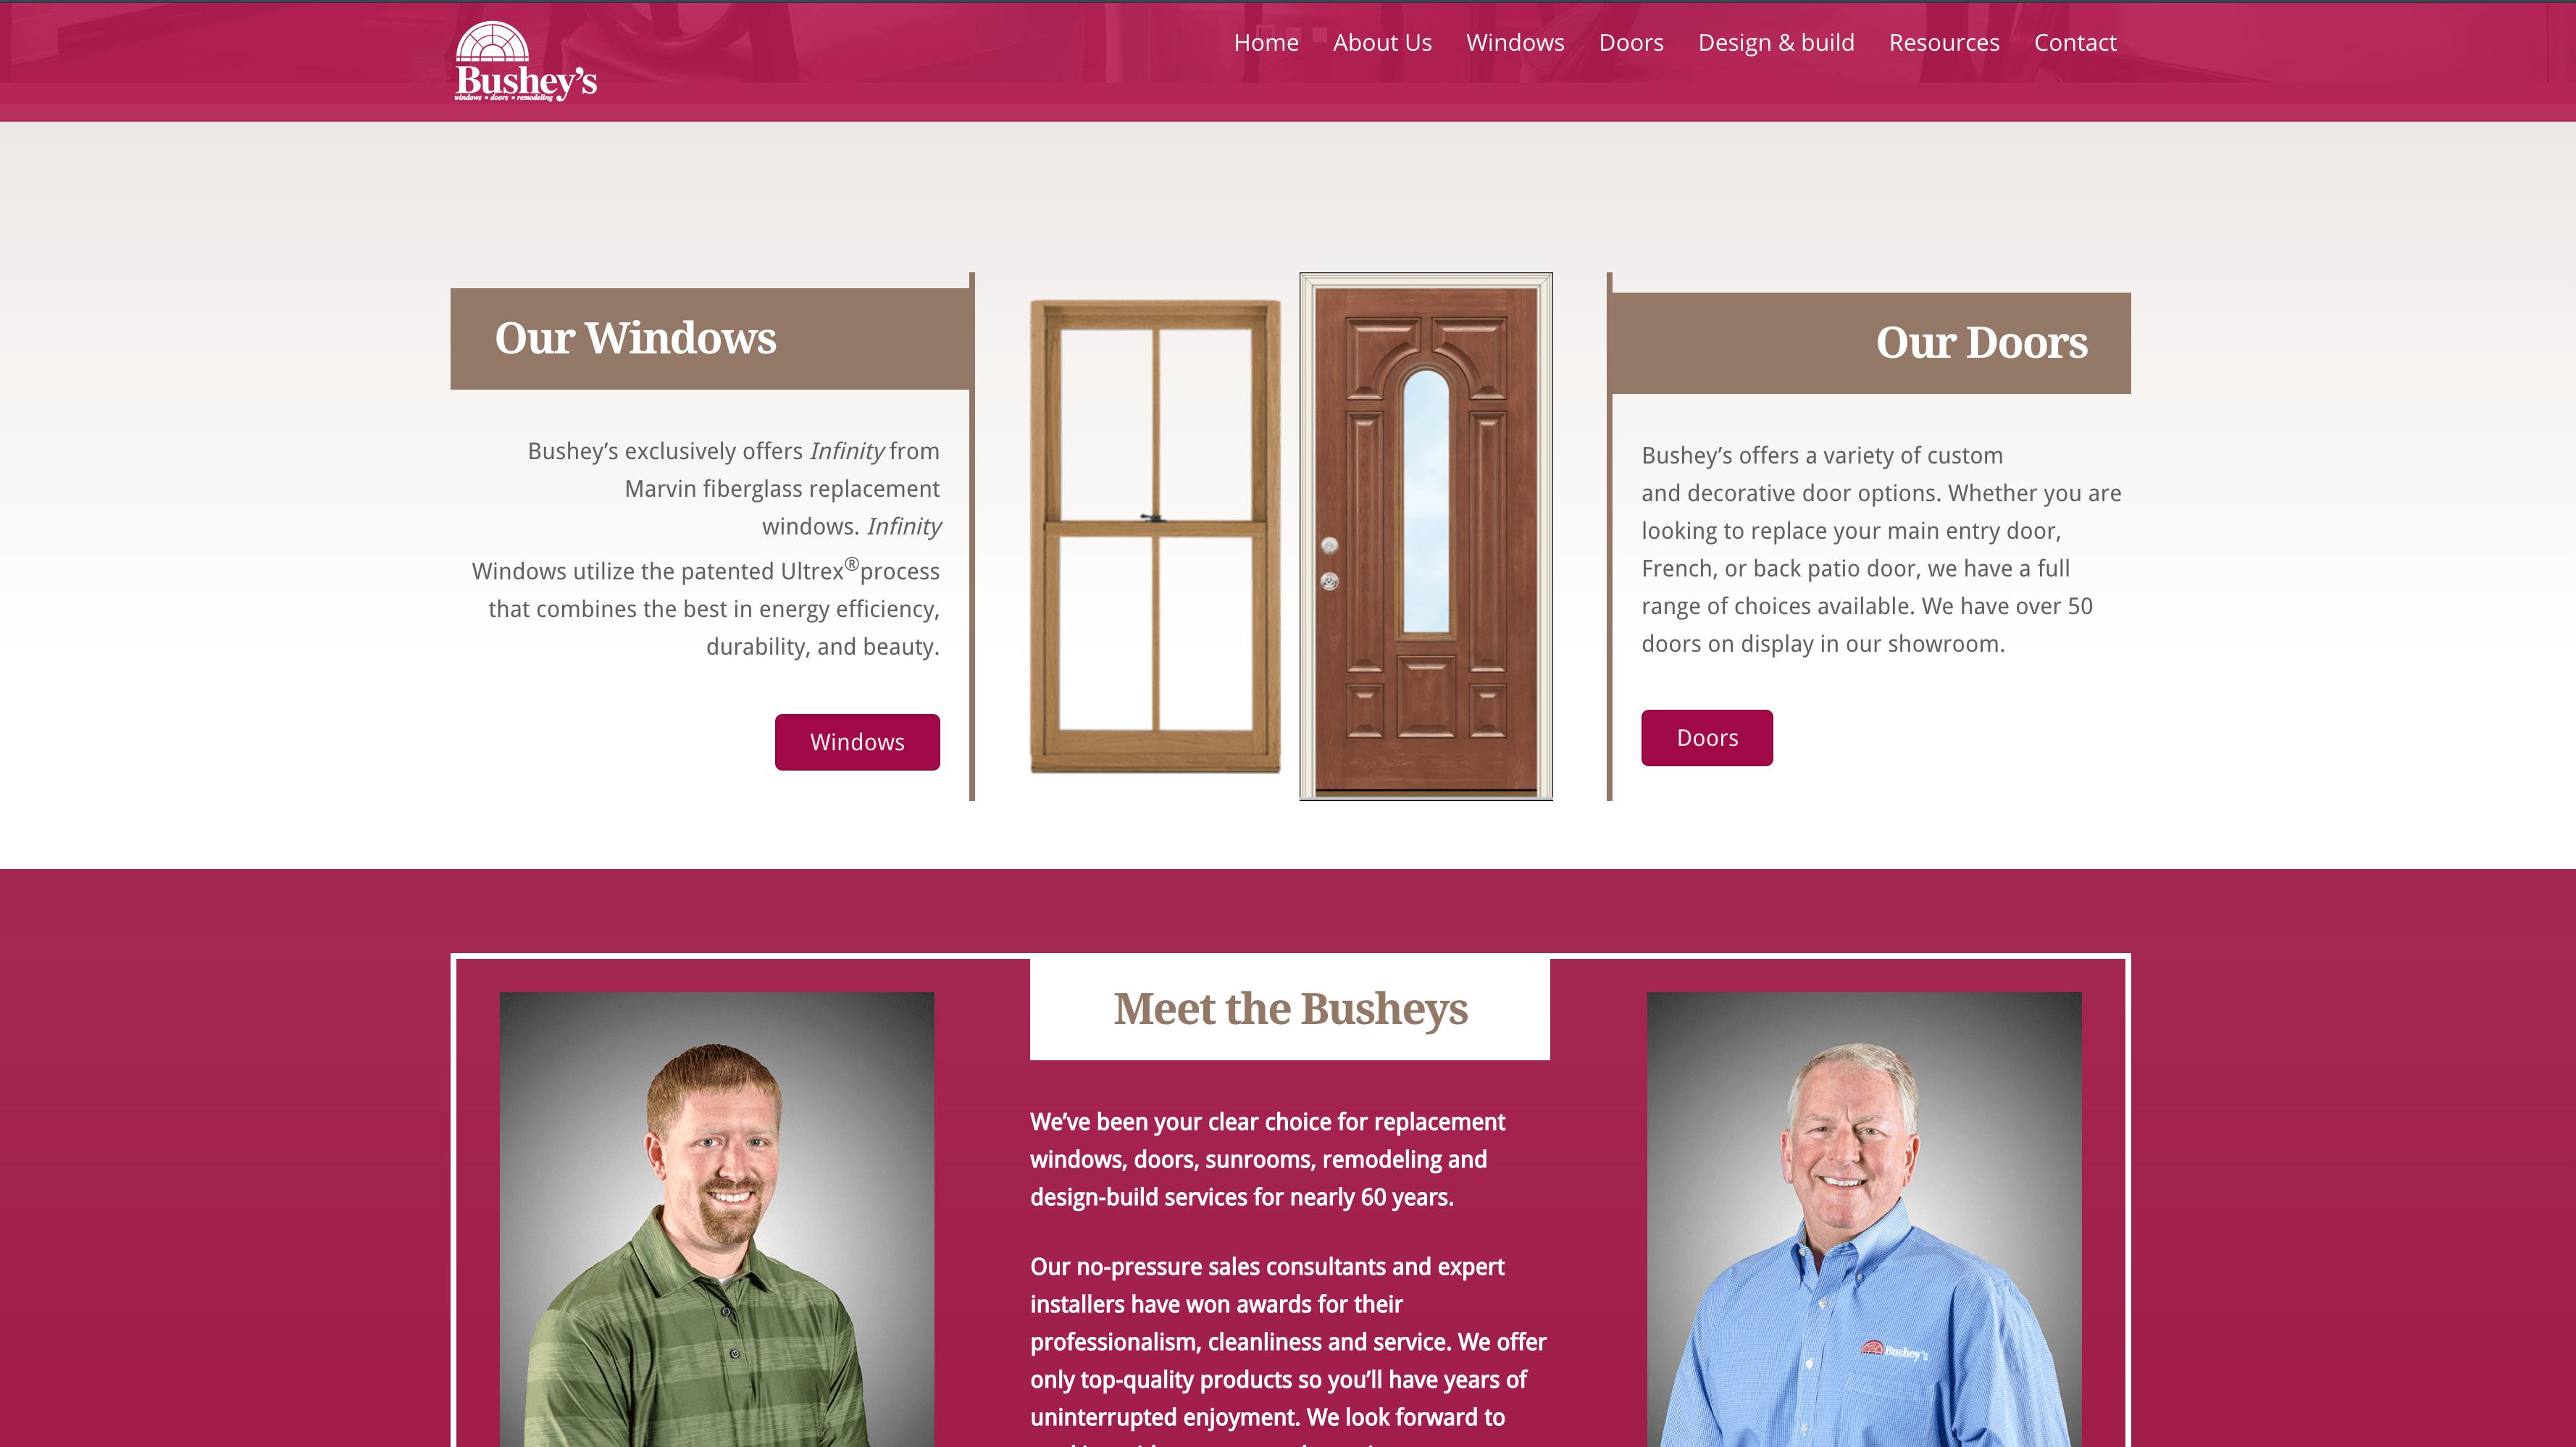 dustin-keeslar-portfolio-website-busheys-windows-doors-and-more2